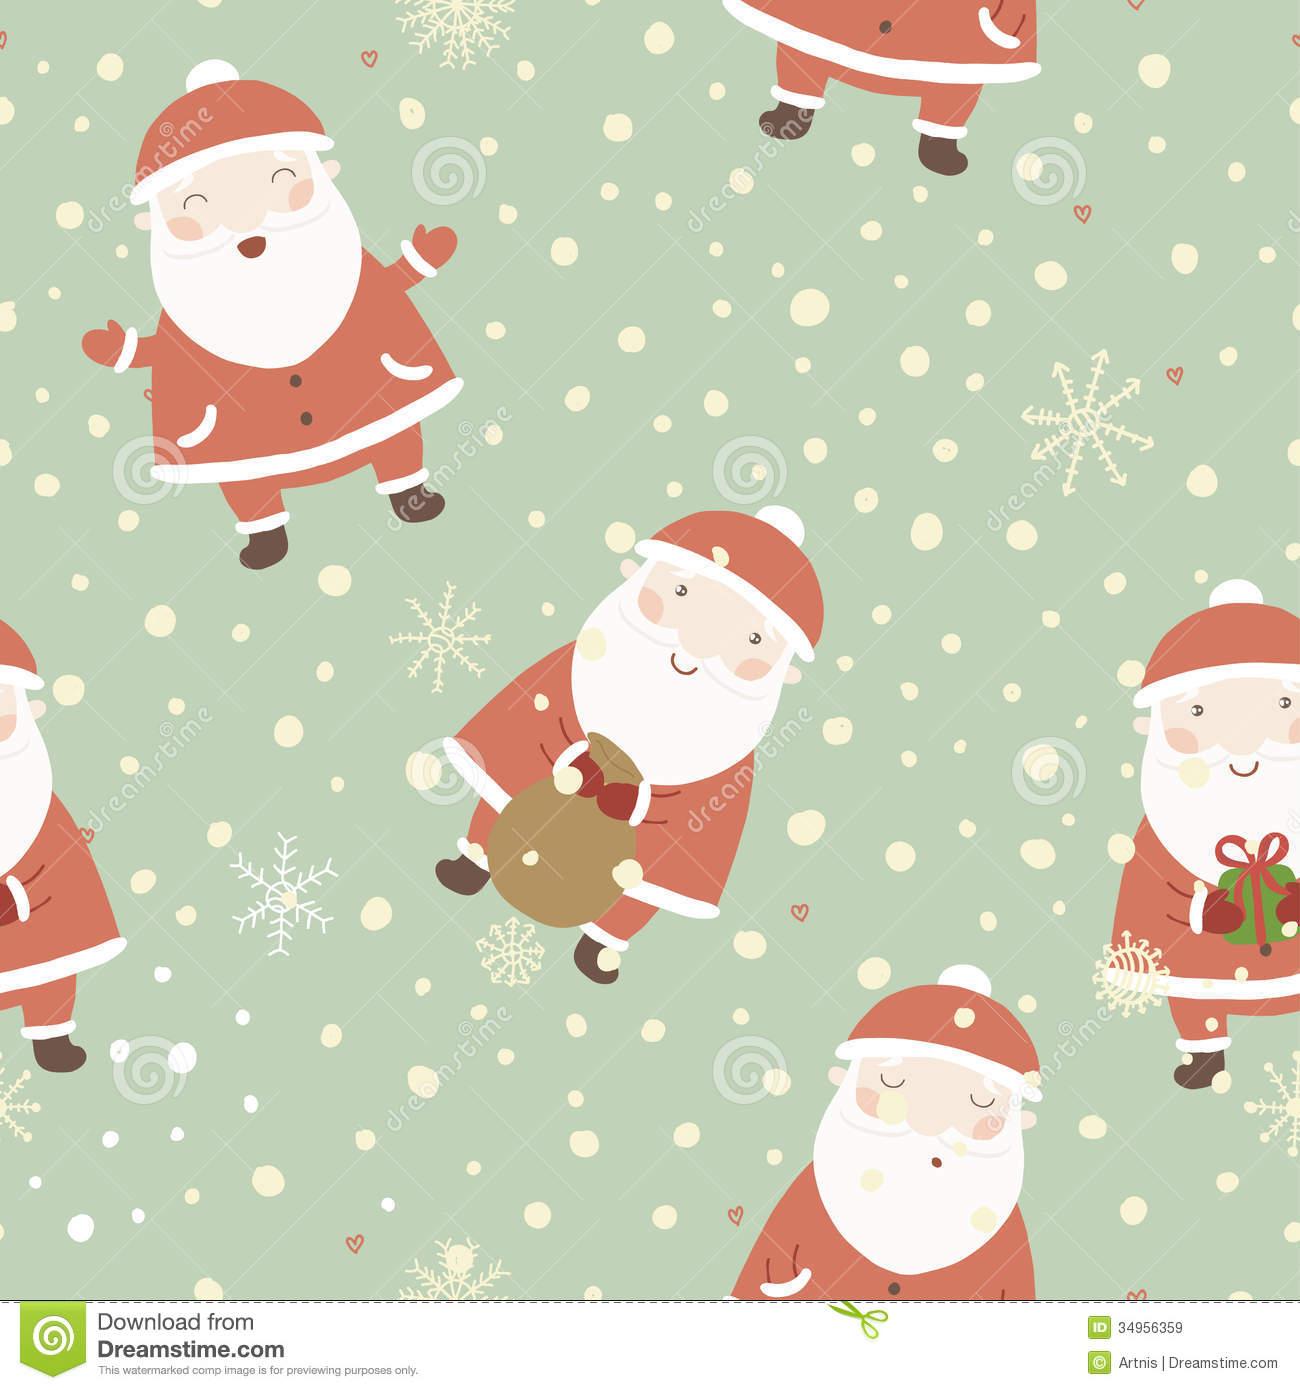 Cute Cartoon Christmas Wallpaper 10560 Hd Wallpapers 1300x1390